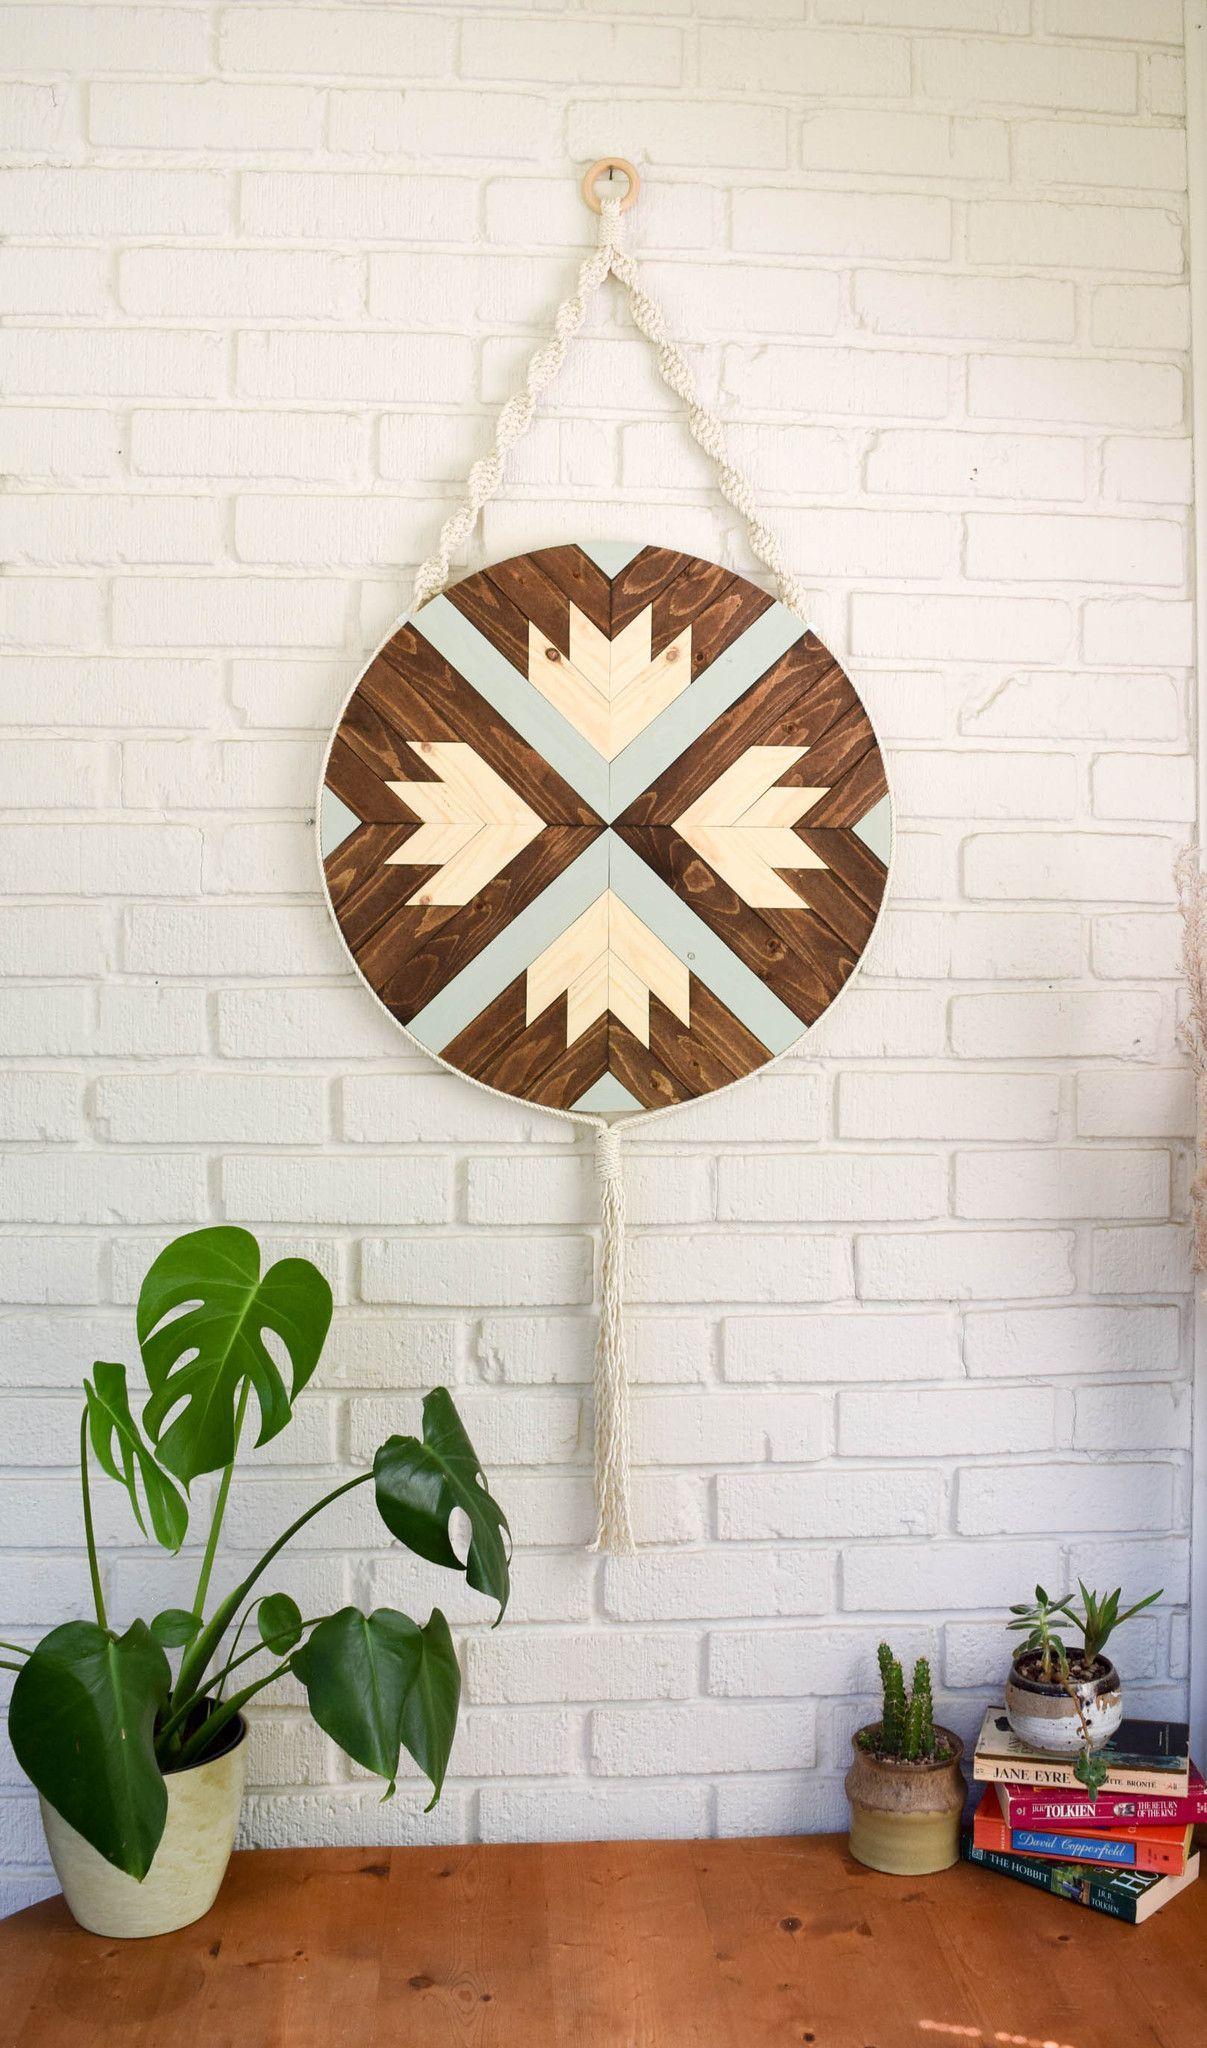 Finch - Round Macrame Wood Wall Art Hanging | wood ...